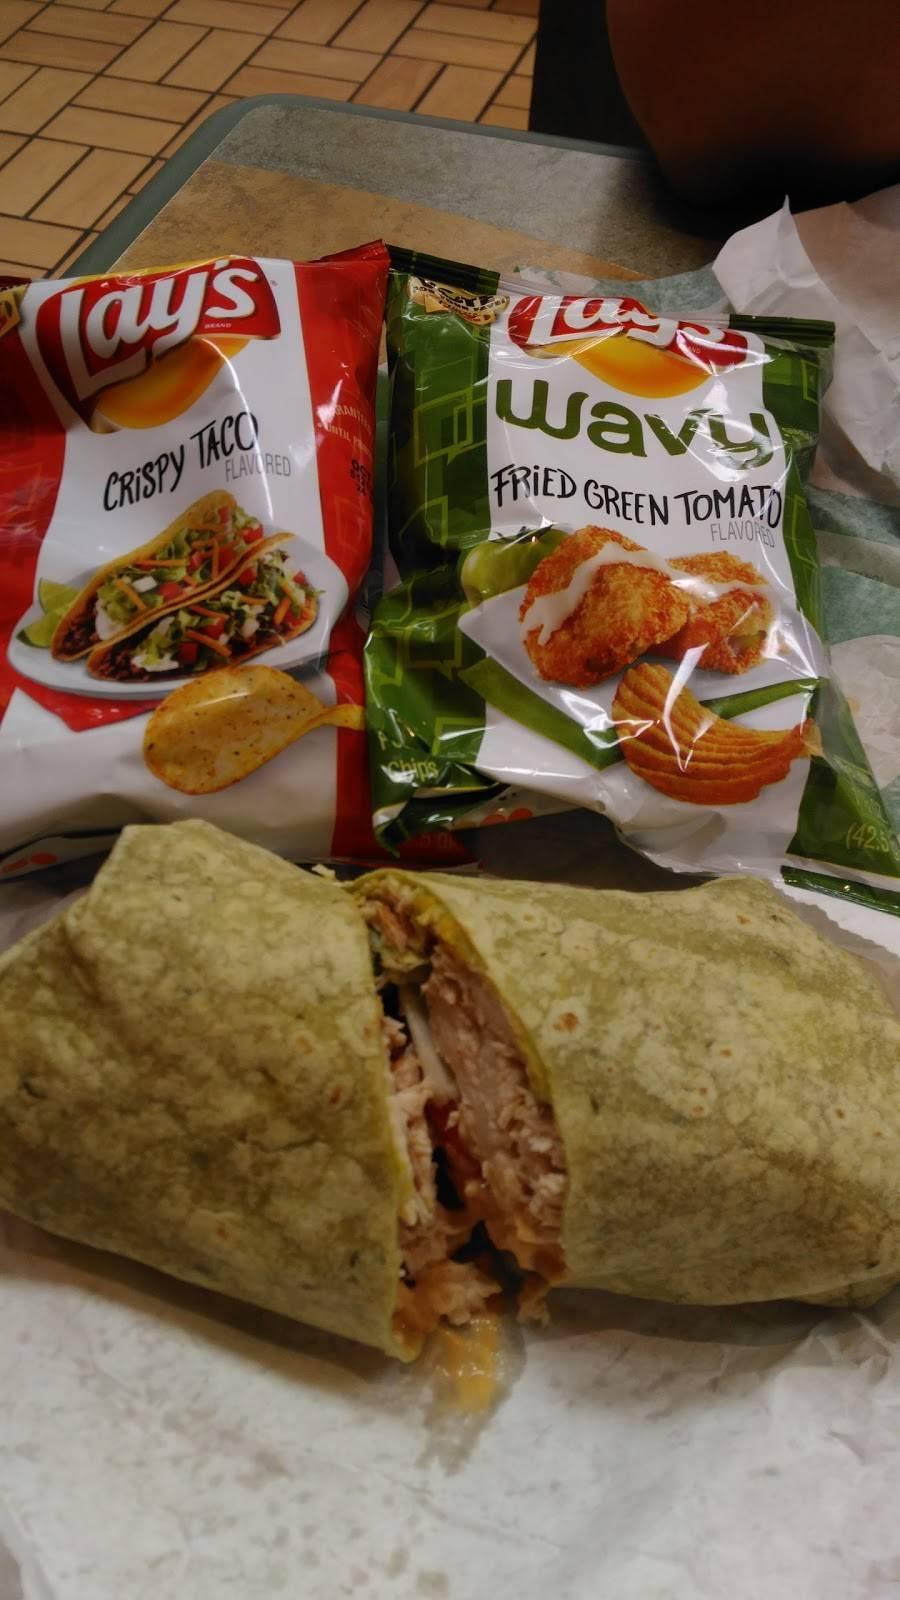 Subway Restaurants | restaurant | 407 McKean Ave, Charleroi, PA 15022, USA | 7244839495 OR +1 724-483-9495